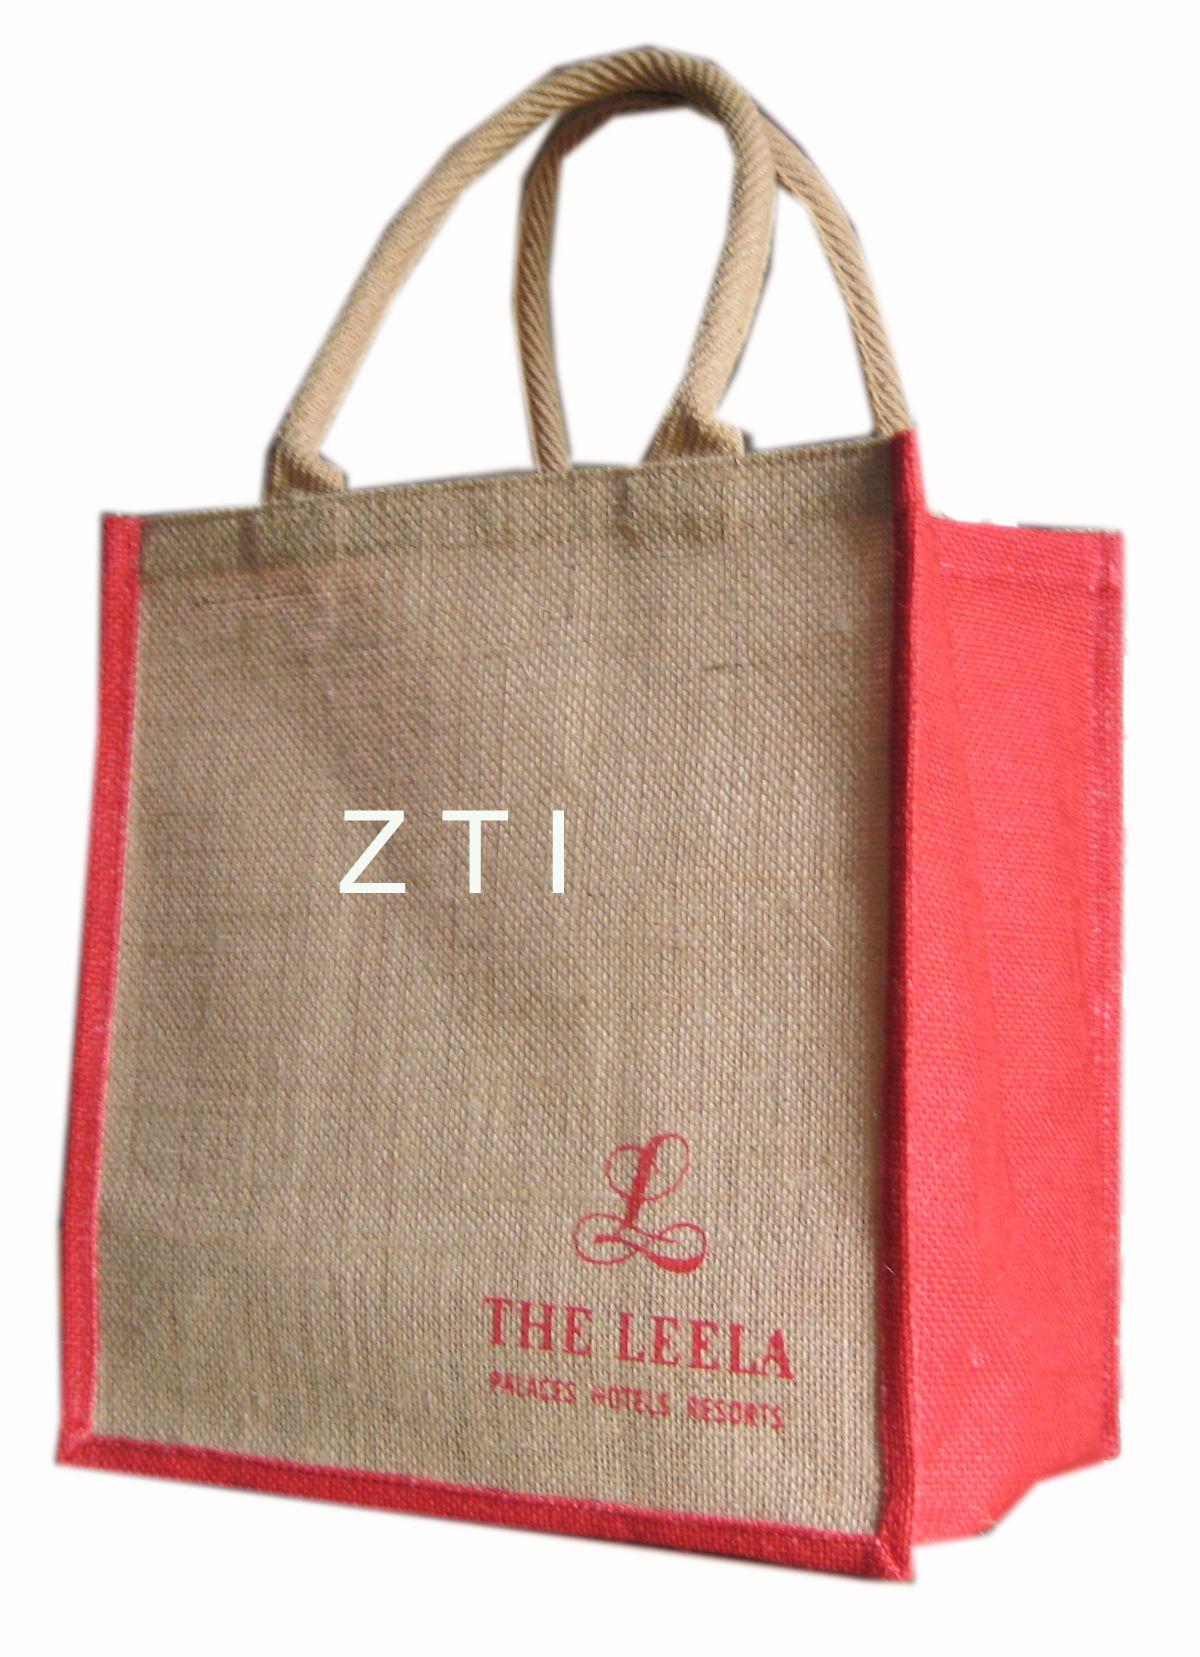 Jp 1301pagesepsitename Jute Bags Manufacturers Jute Bags Jute Bags Design